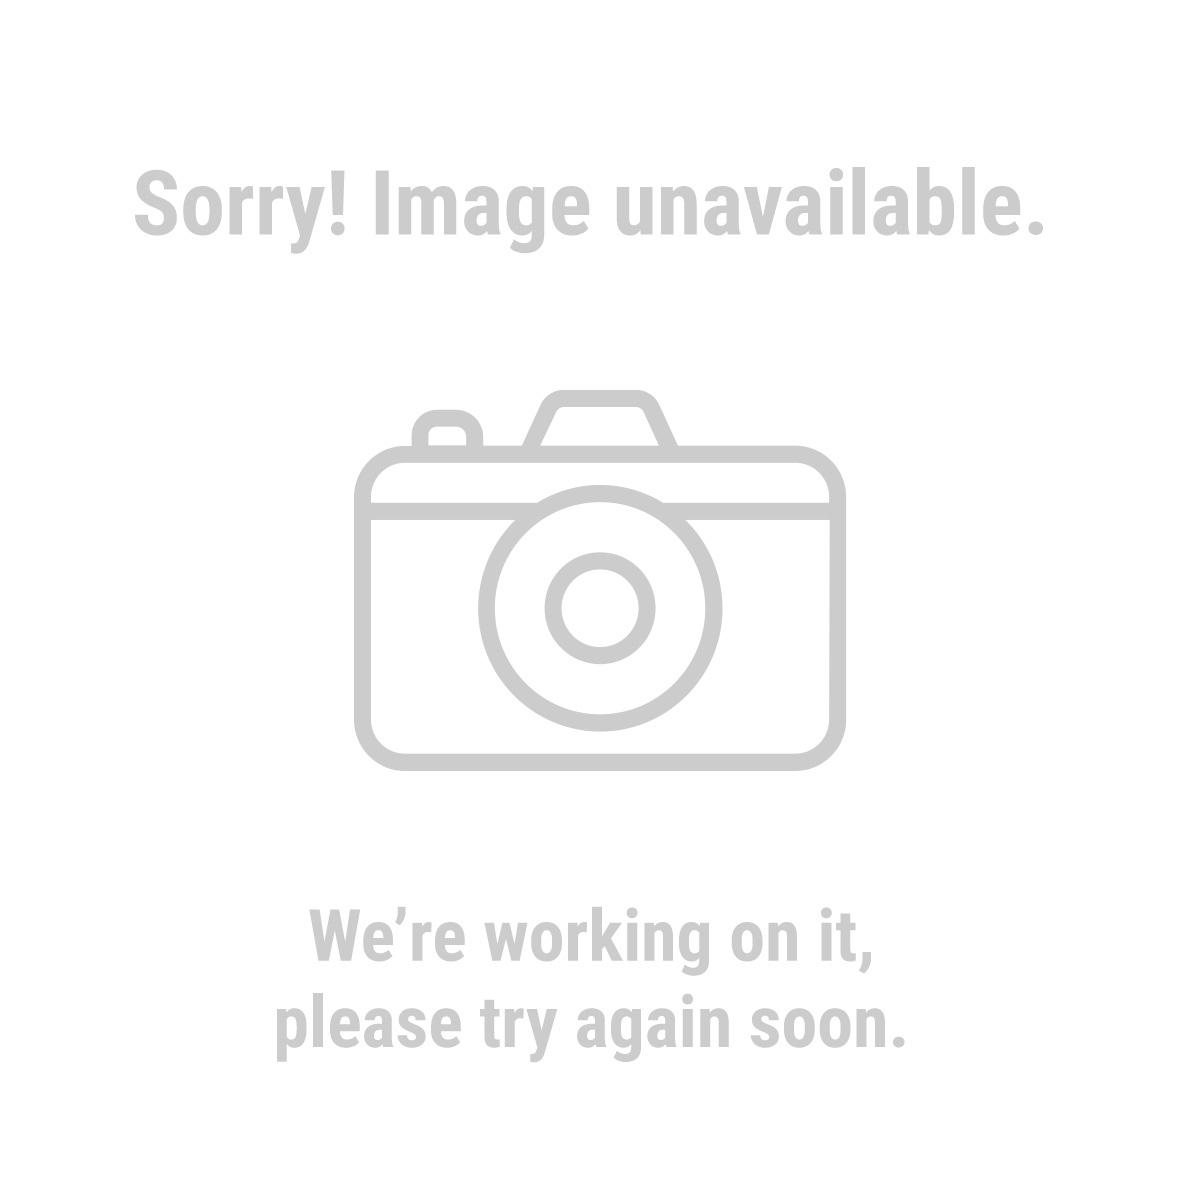 95983 3 Ft. x 5 Ft. American Flag